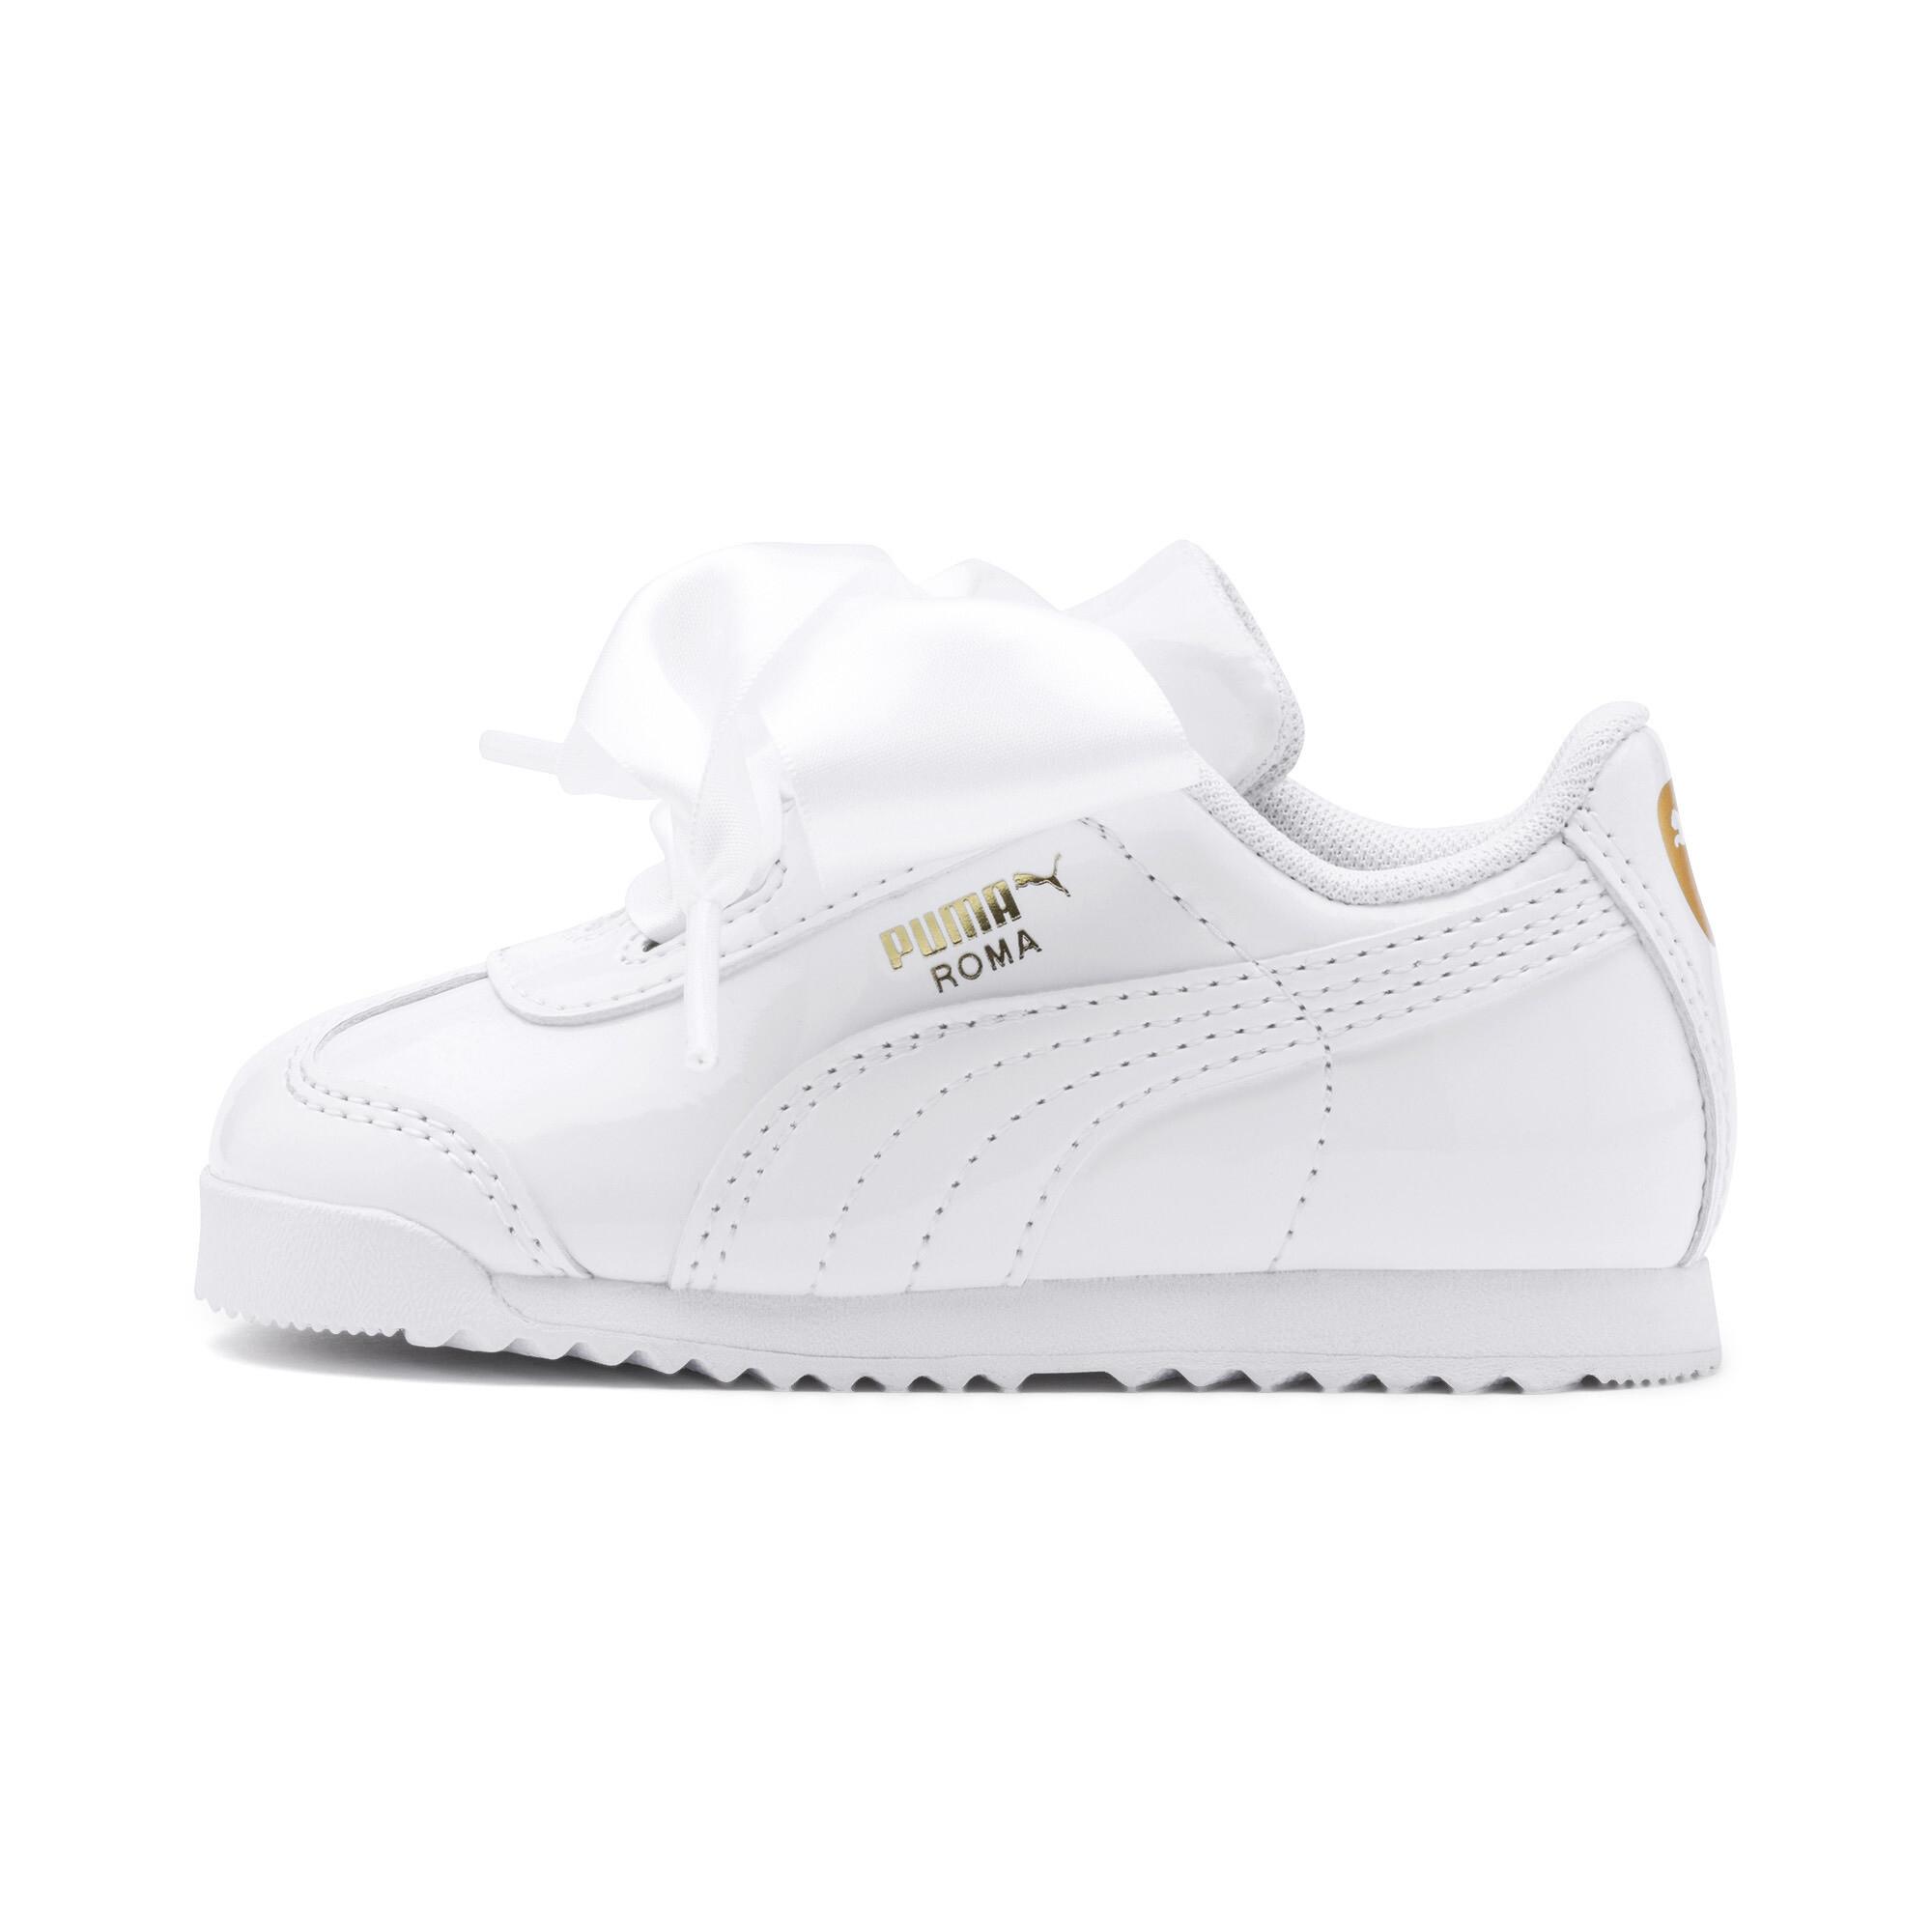 PUMA-Roma-Heart-Patent-Toddler-Shoes-Girls-Shoe-Kids thumbnail 10